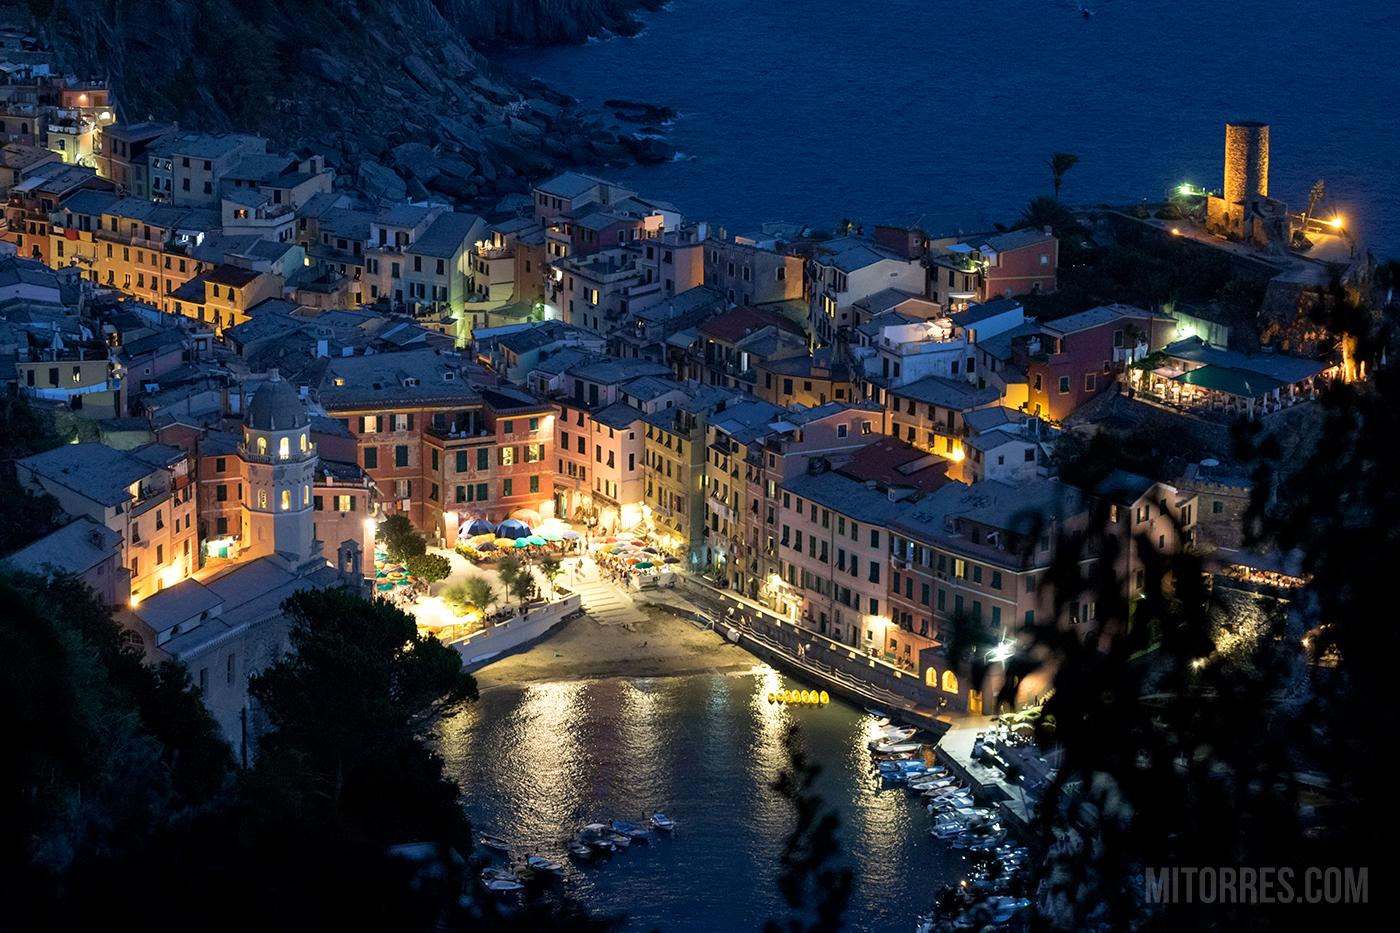 Night shot of Vernazza, Cinque Terre, Italy. Photo: Marlon I. Torres